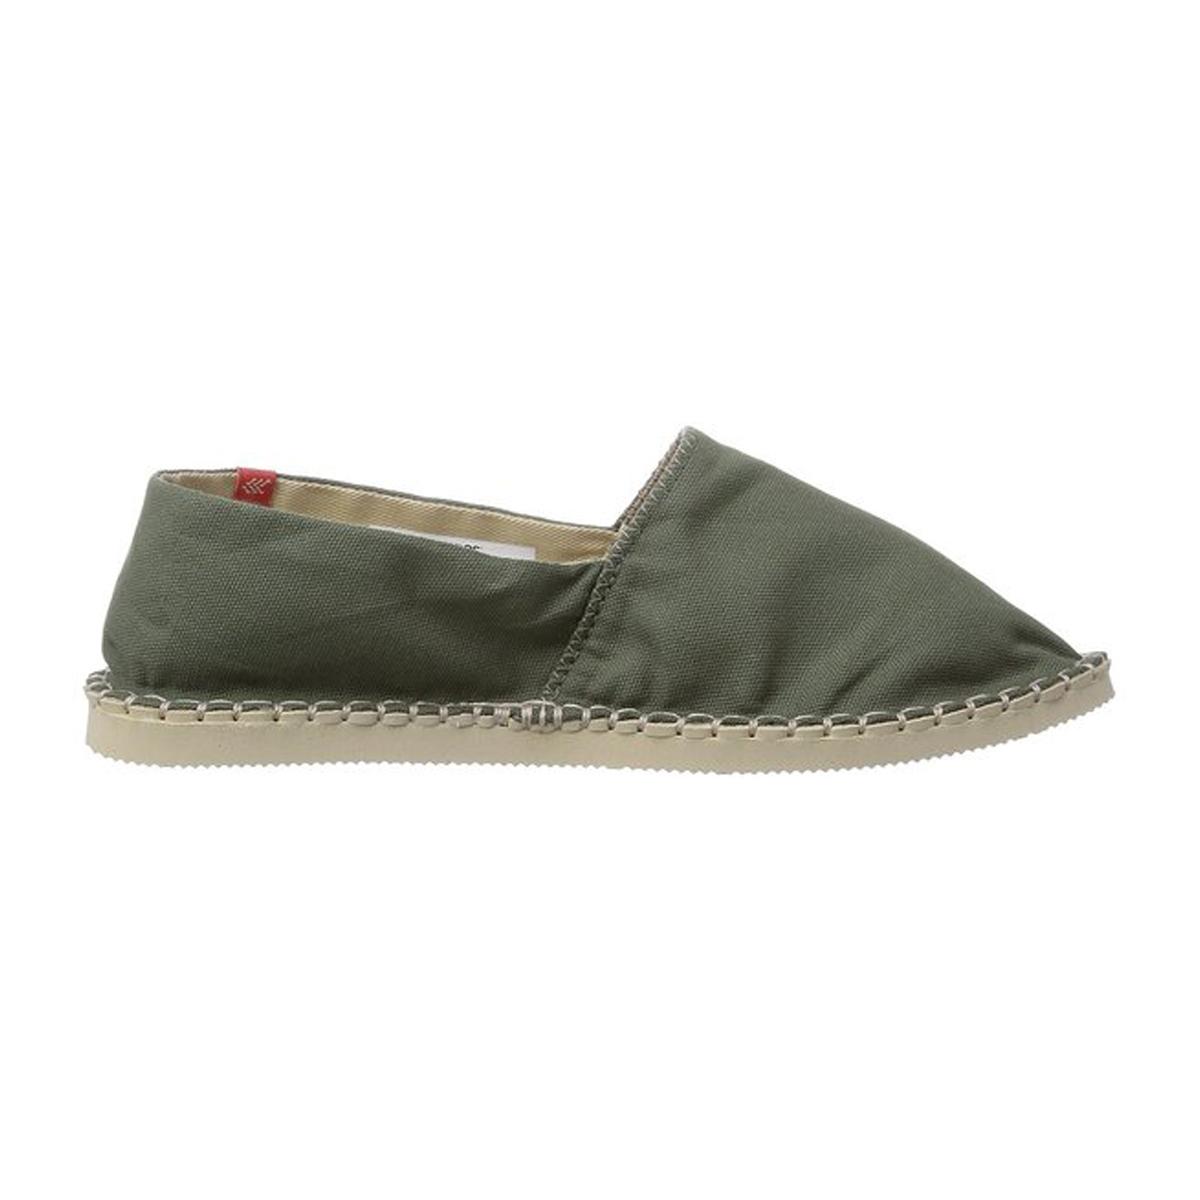 640e0d4e1ef0d ... Havaianas espadrilles with khaki green uppers and beige soles - Origine  II Green ...